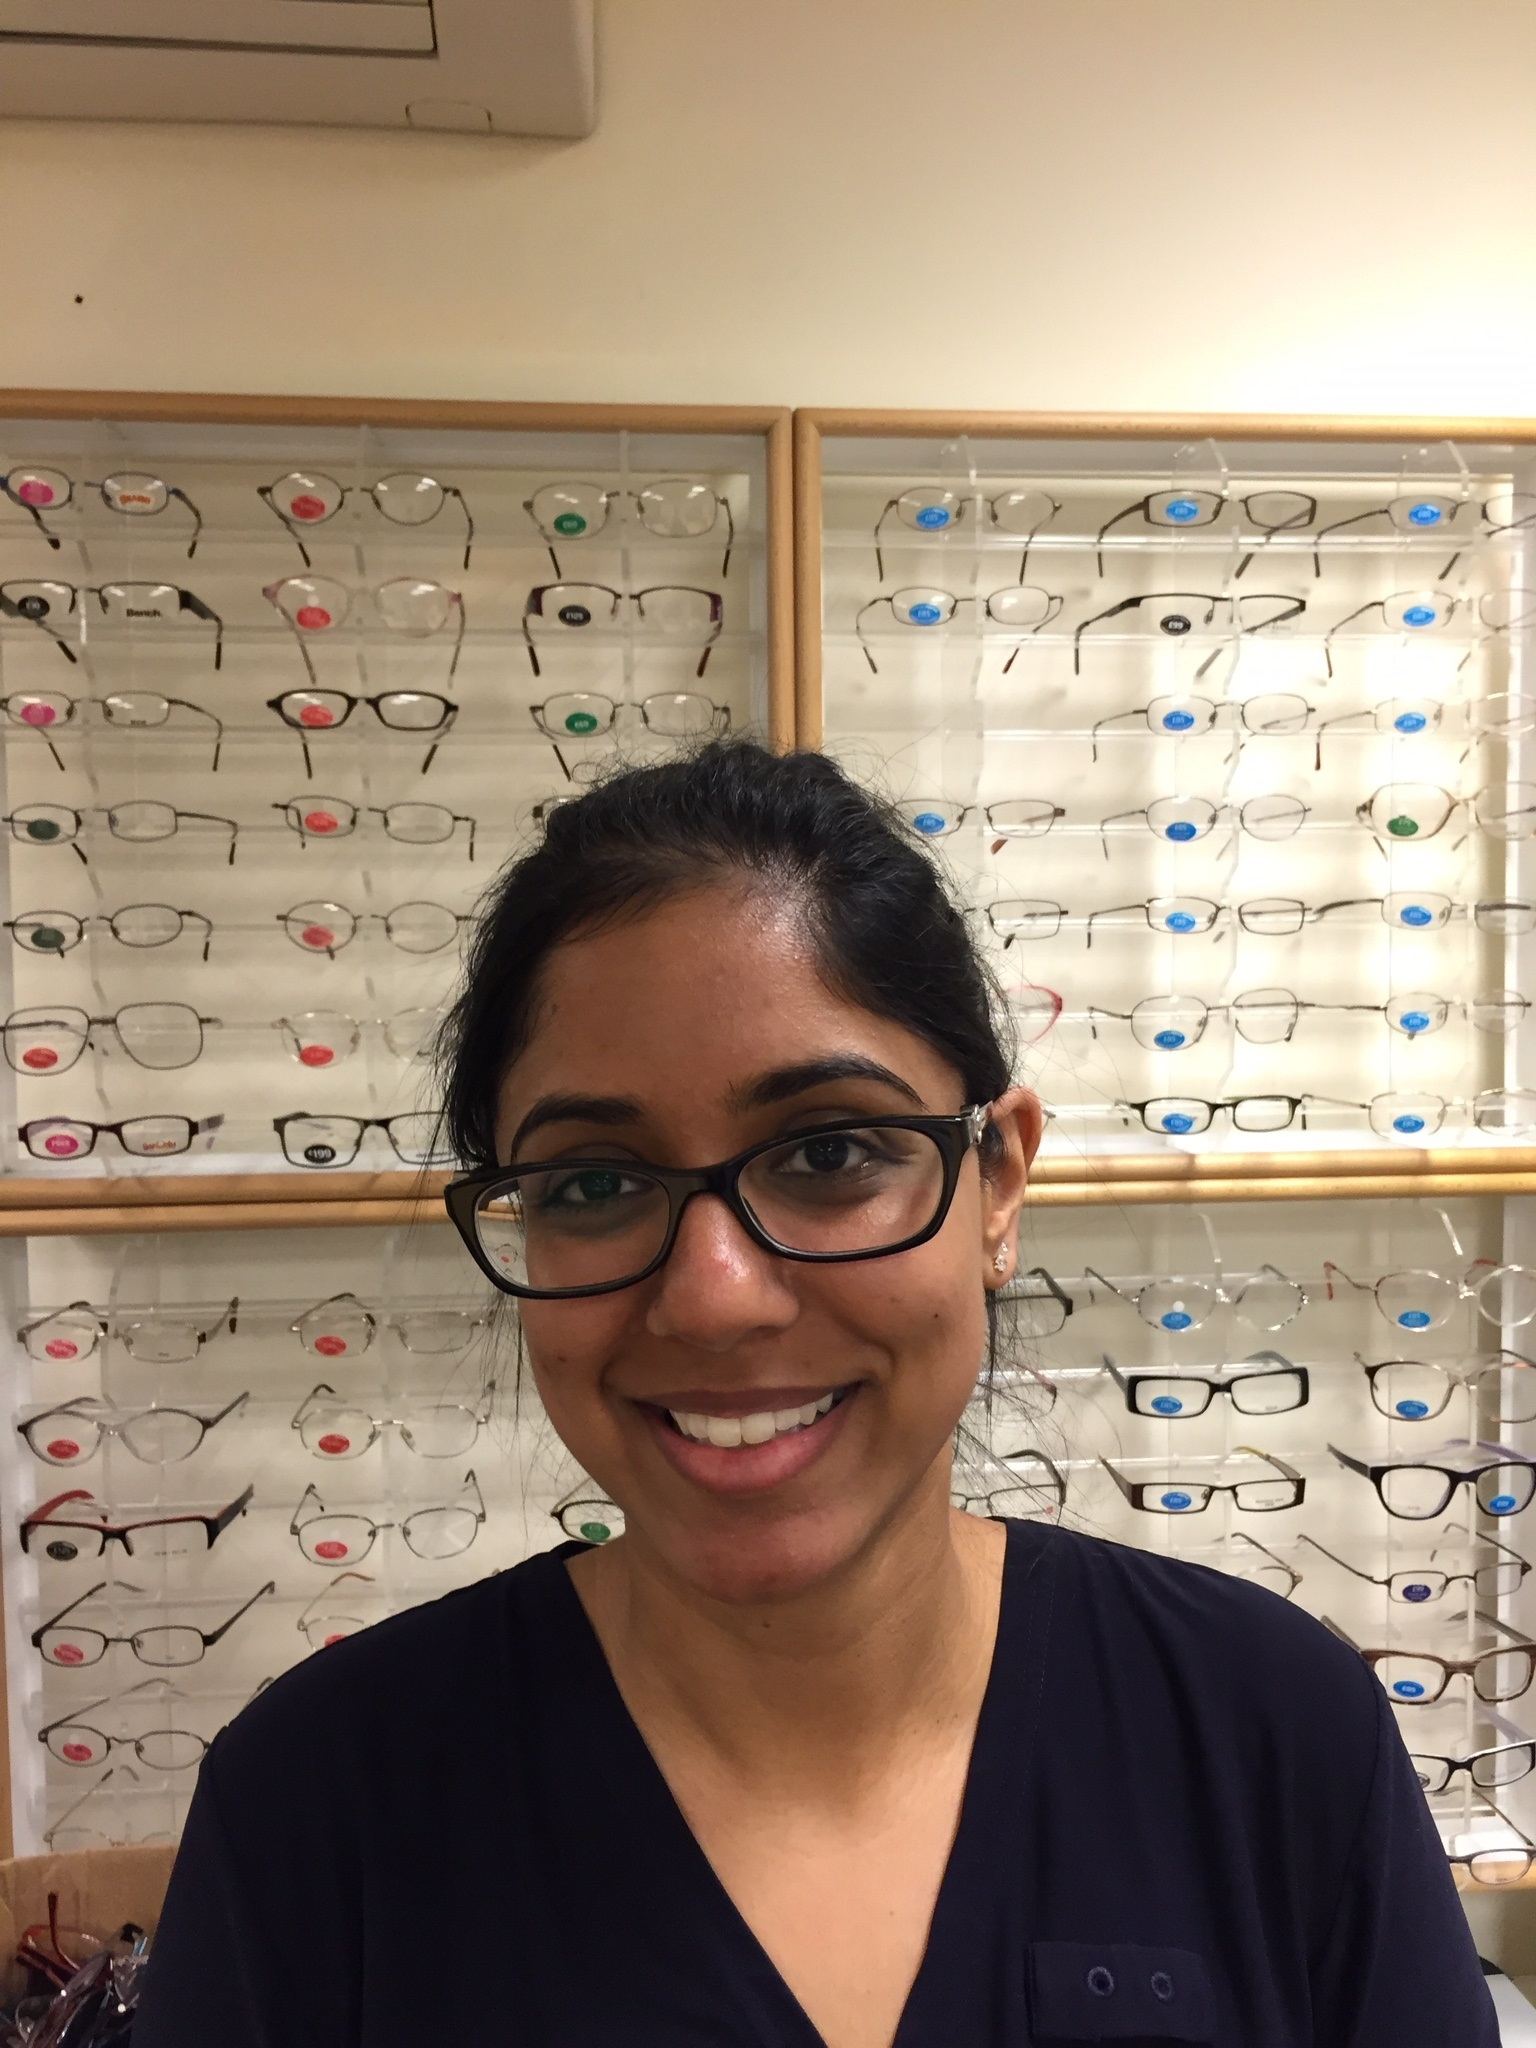 Sunita is an optometrist at Specsavers Gravesend